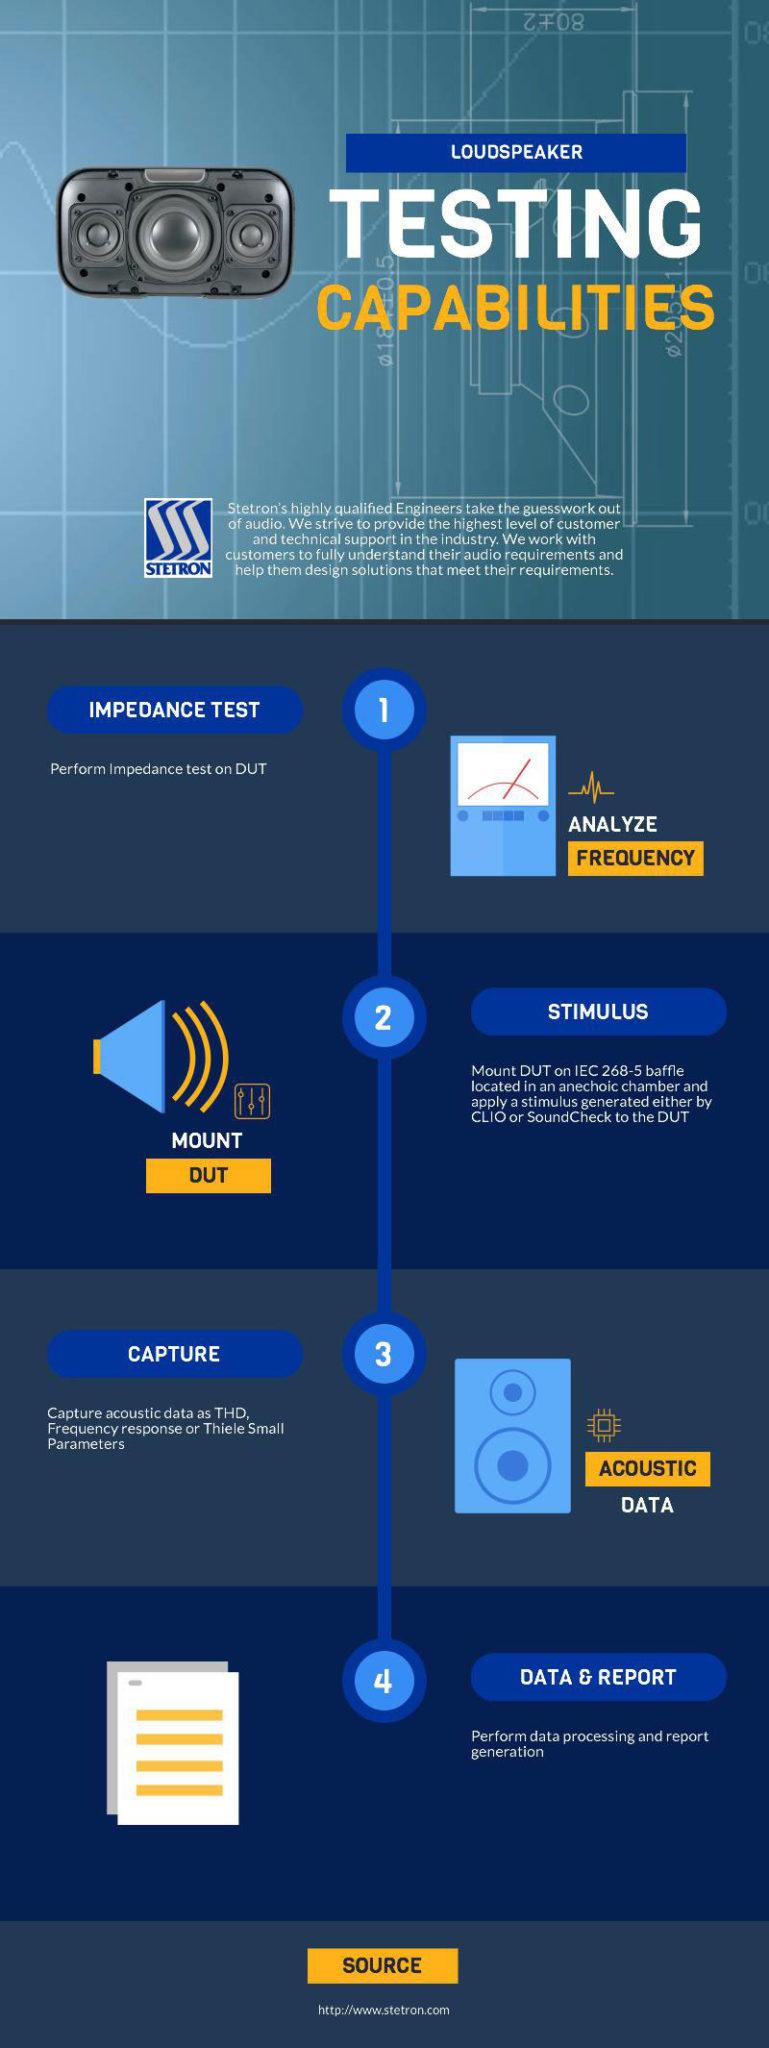 Loudspeaker Testing Capabilities